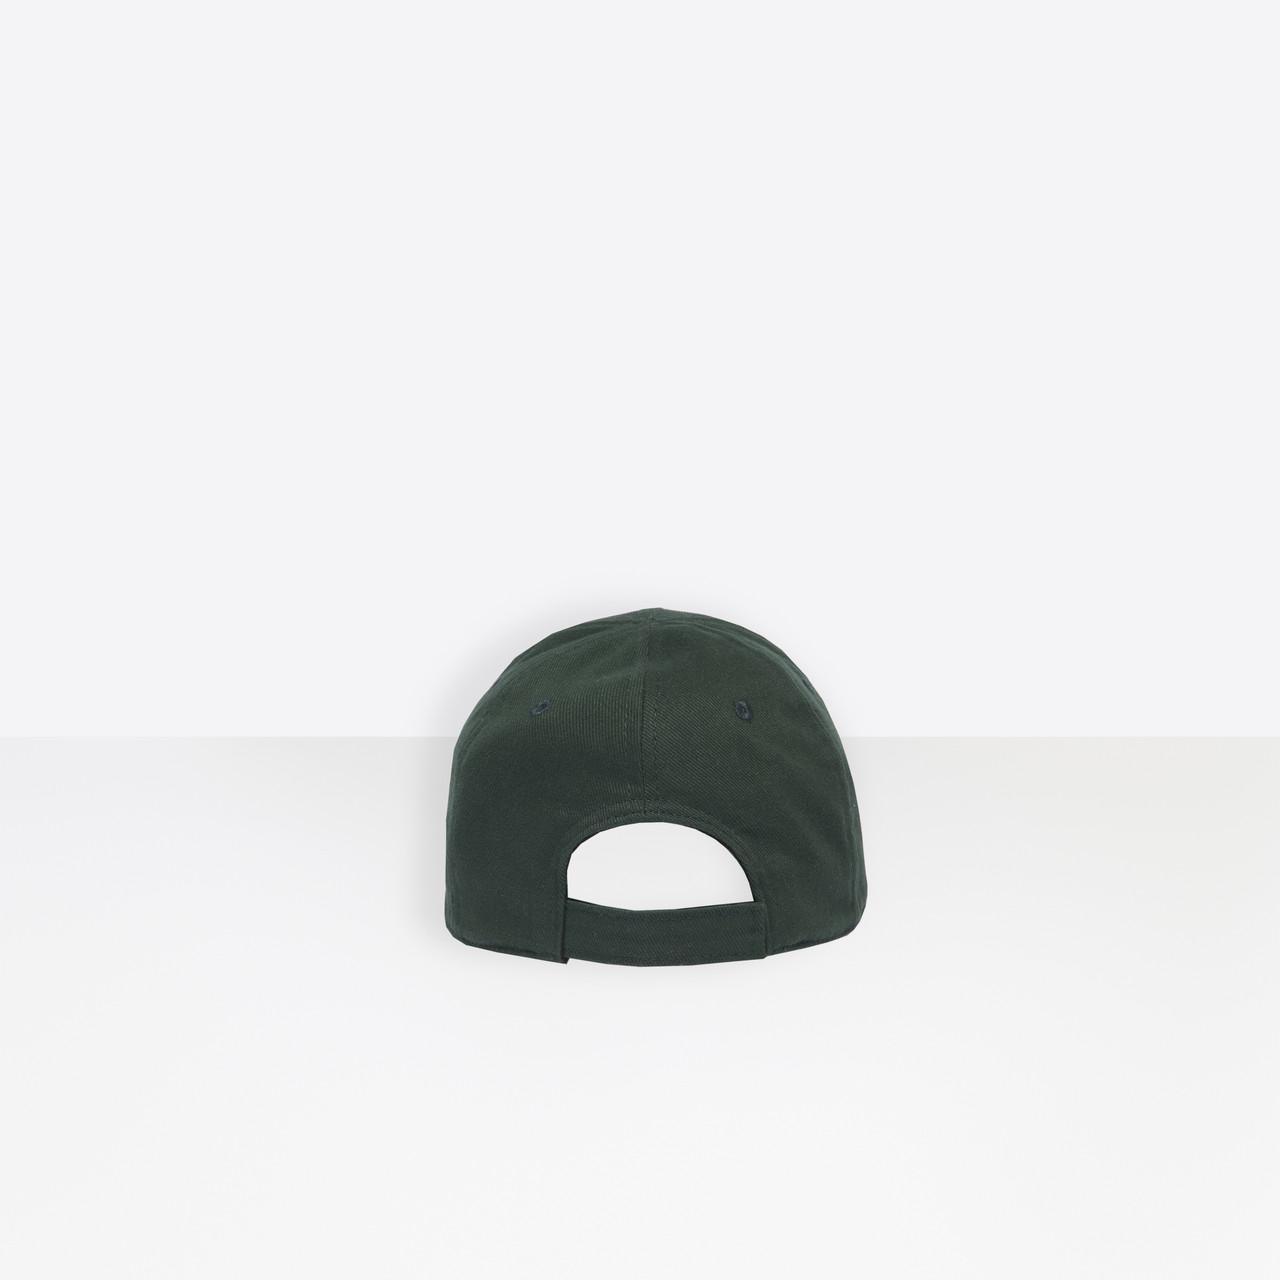 5a43c7f53c6 Lyst - Balenciaga Cap in Green